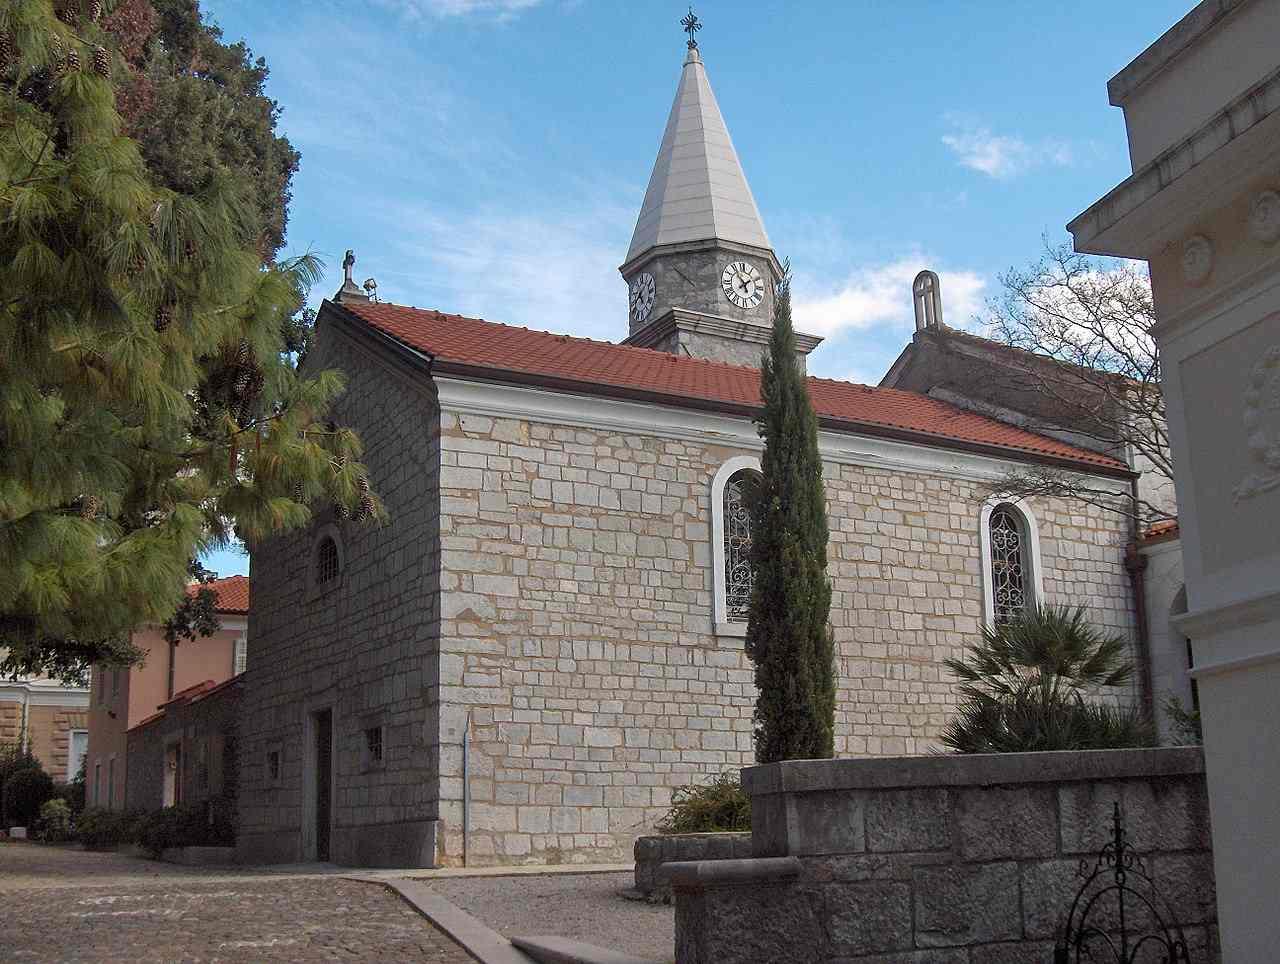 Saint James's Church, Opatija, Croatia